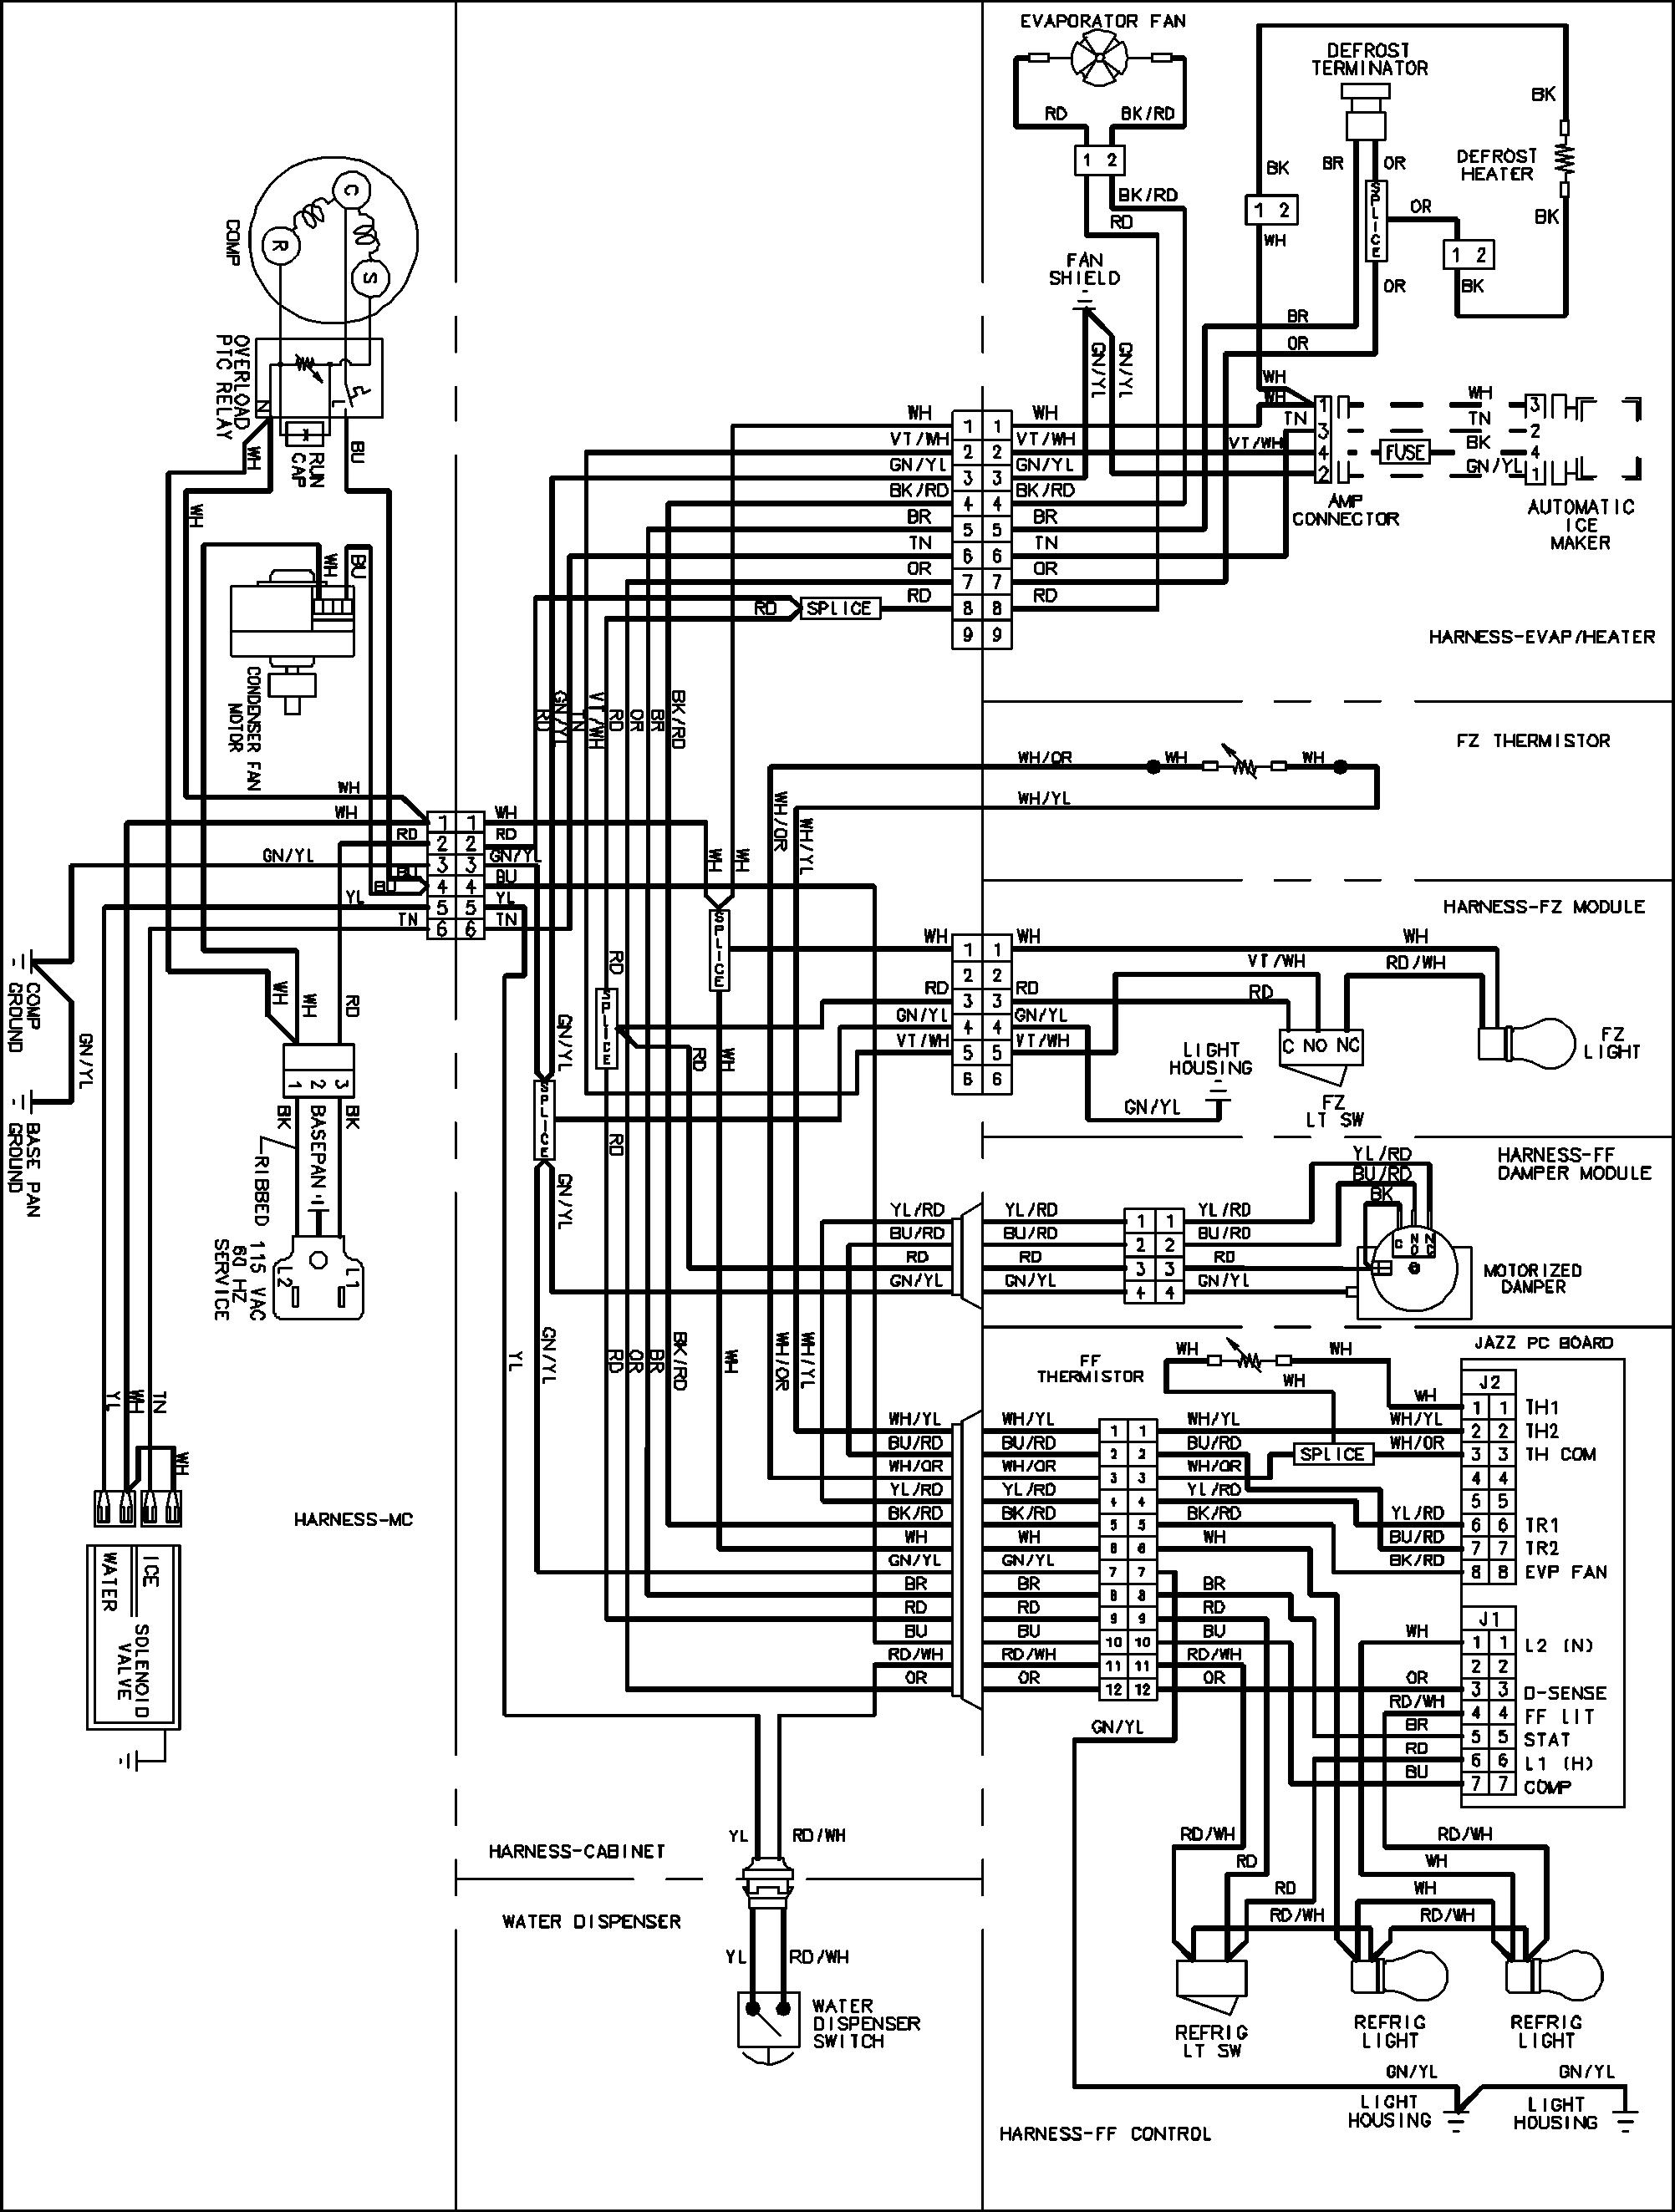 HT_3880] Refrigerator Wiring Diagram Further Amana Refrigerator Wiring  DiagramWigeg Winn Xortanet Salv Mohammedshrine Librar Wiring 101